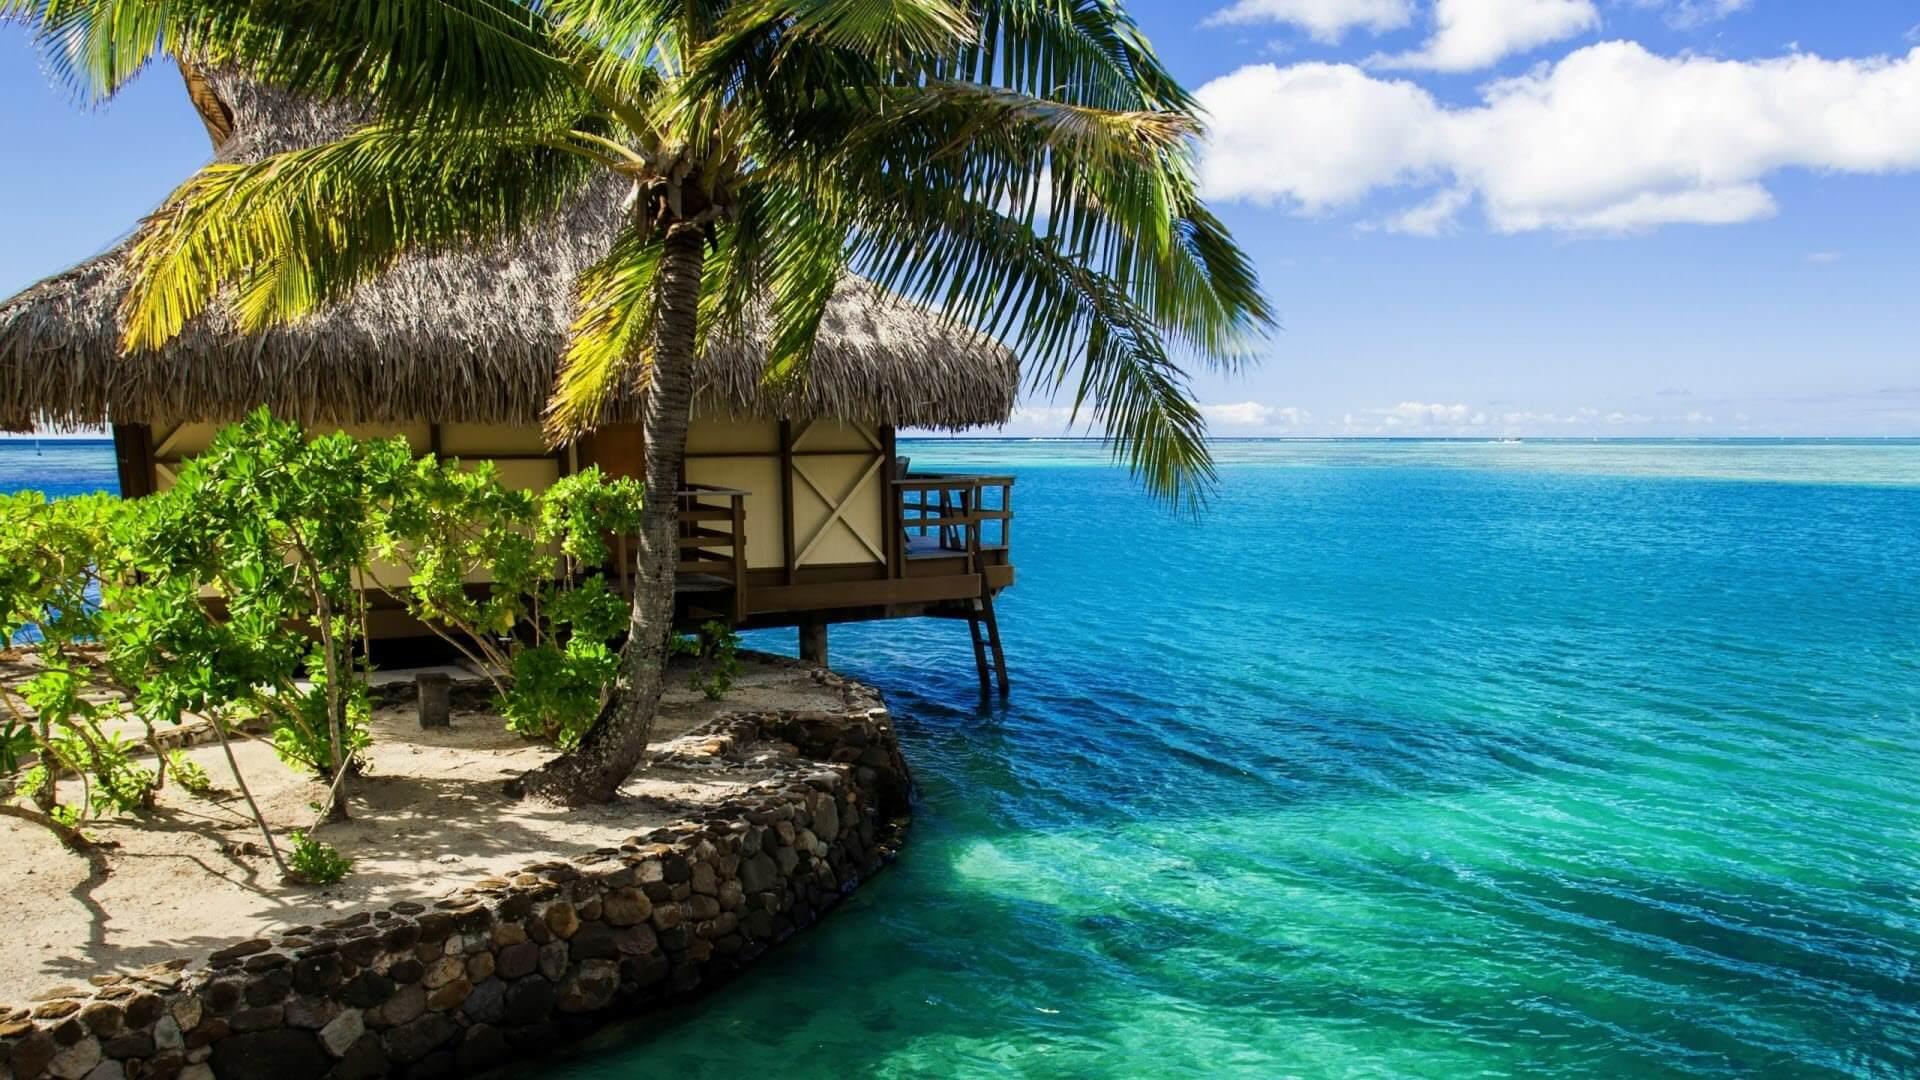 Maldives Super Amazing Holiday Travel & Tour Package